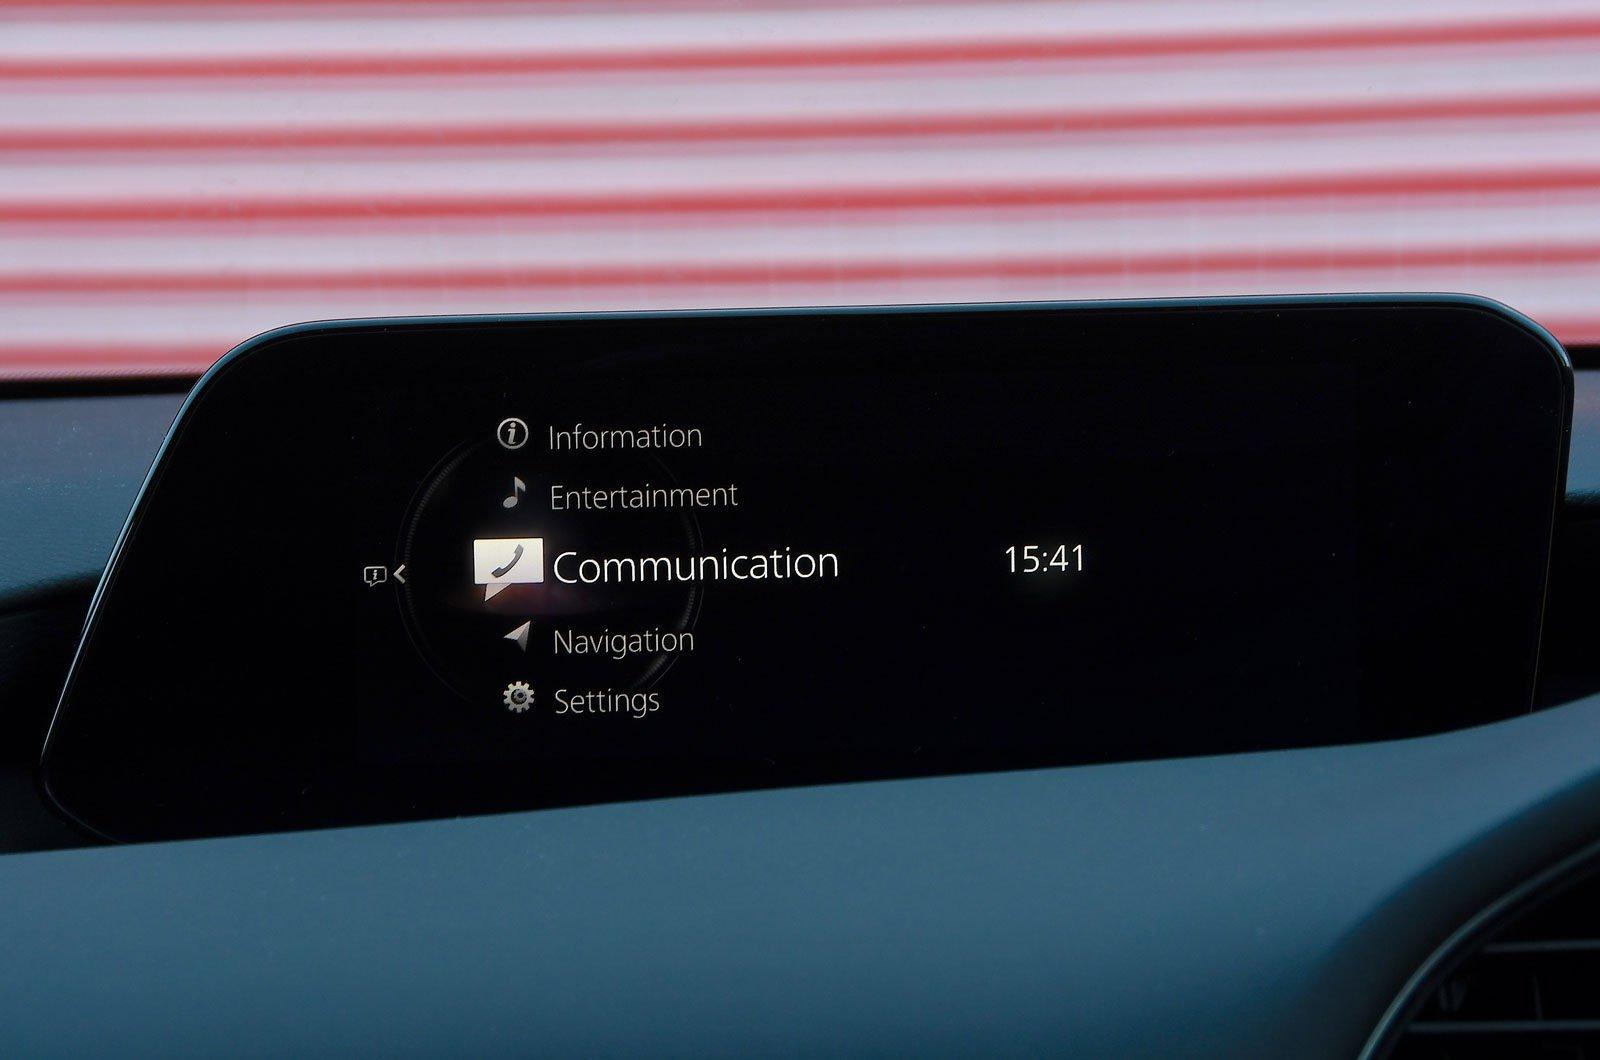 Mazda infotainment screen